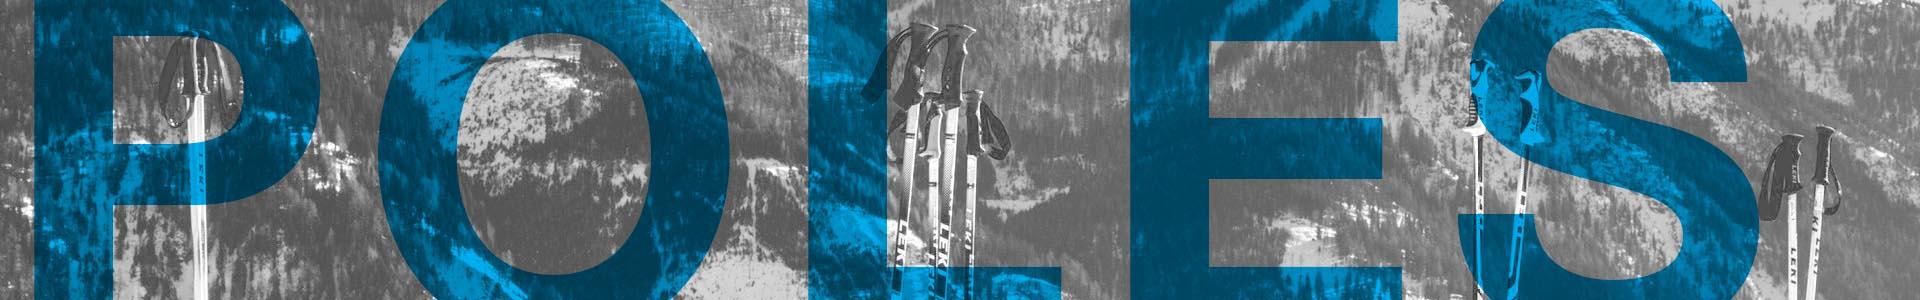 ski-poles-1920x300.jpg